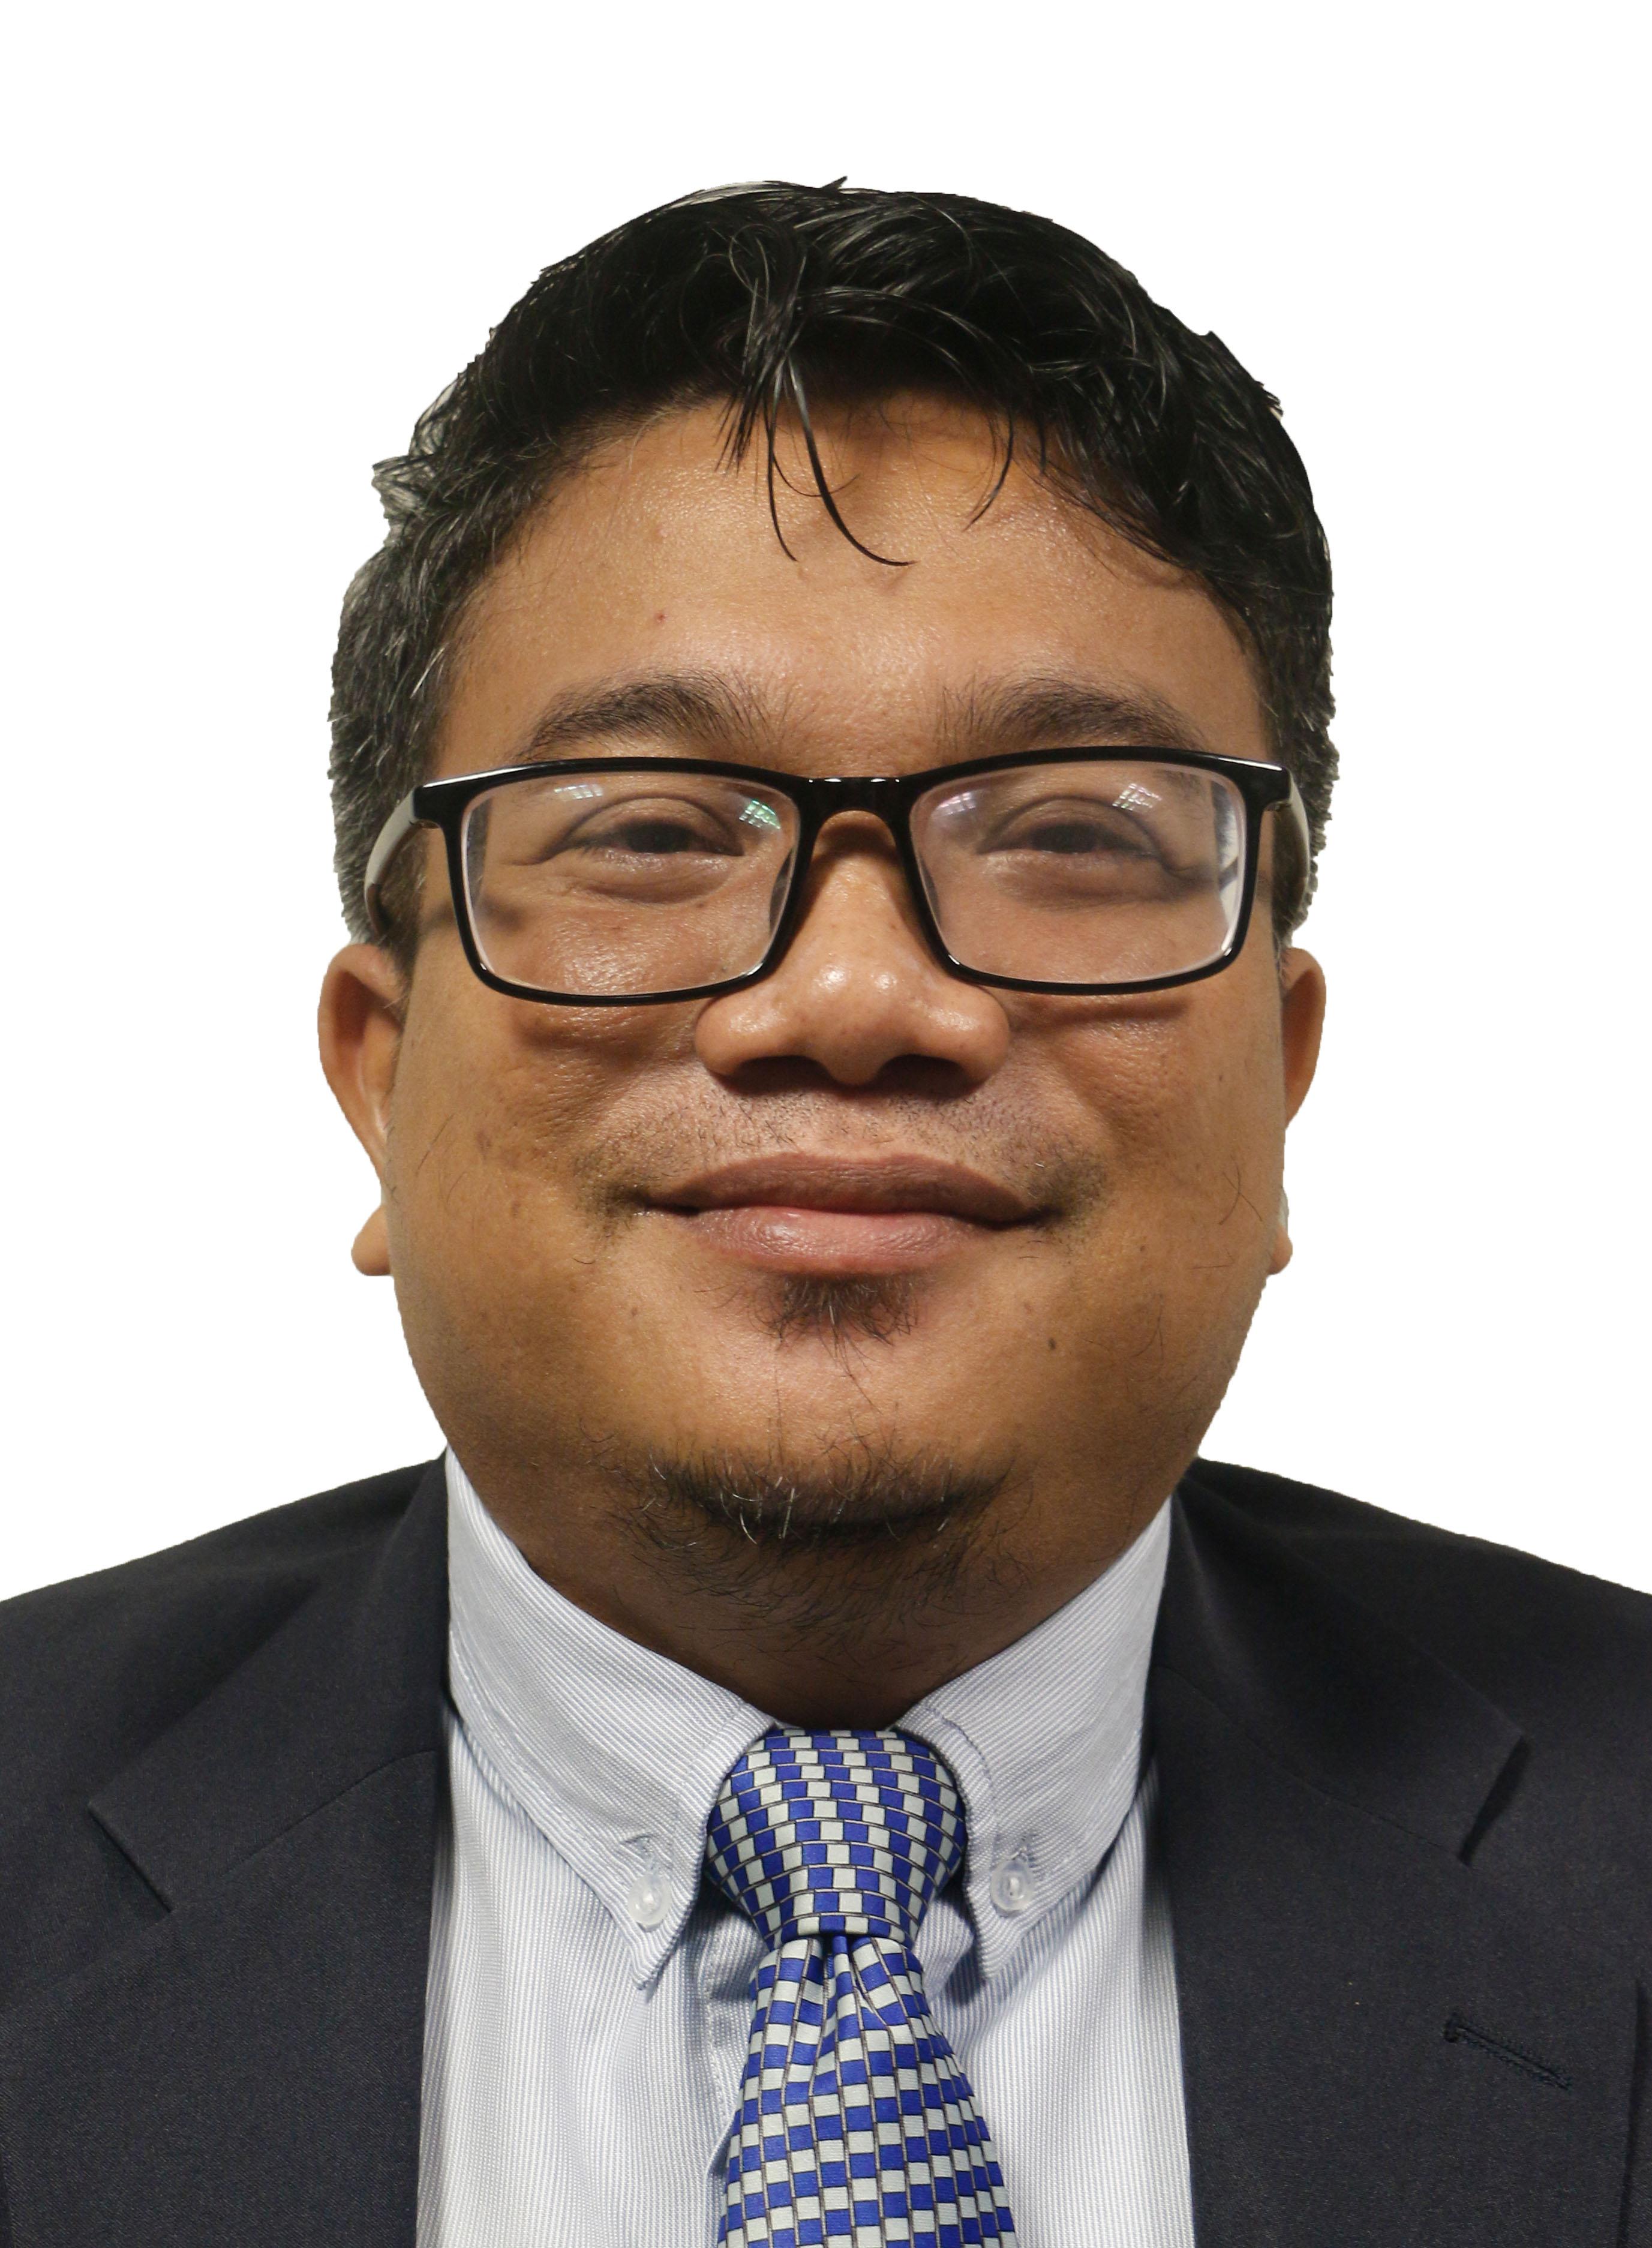 Barry Samson Ak Lainchung